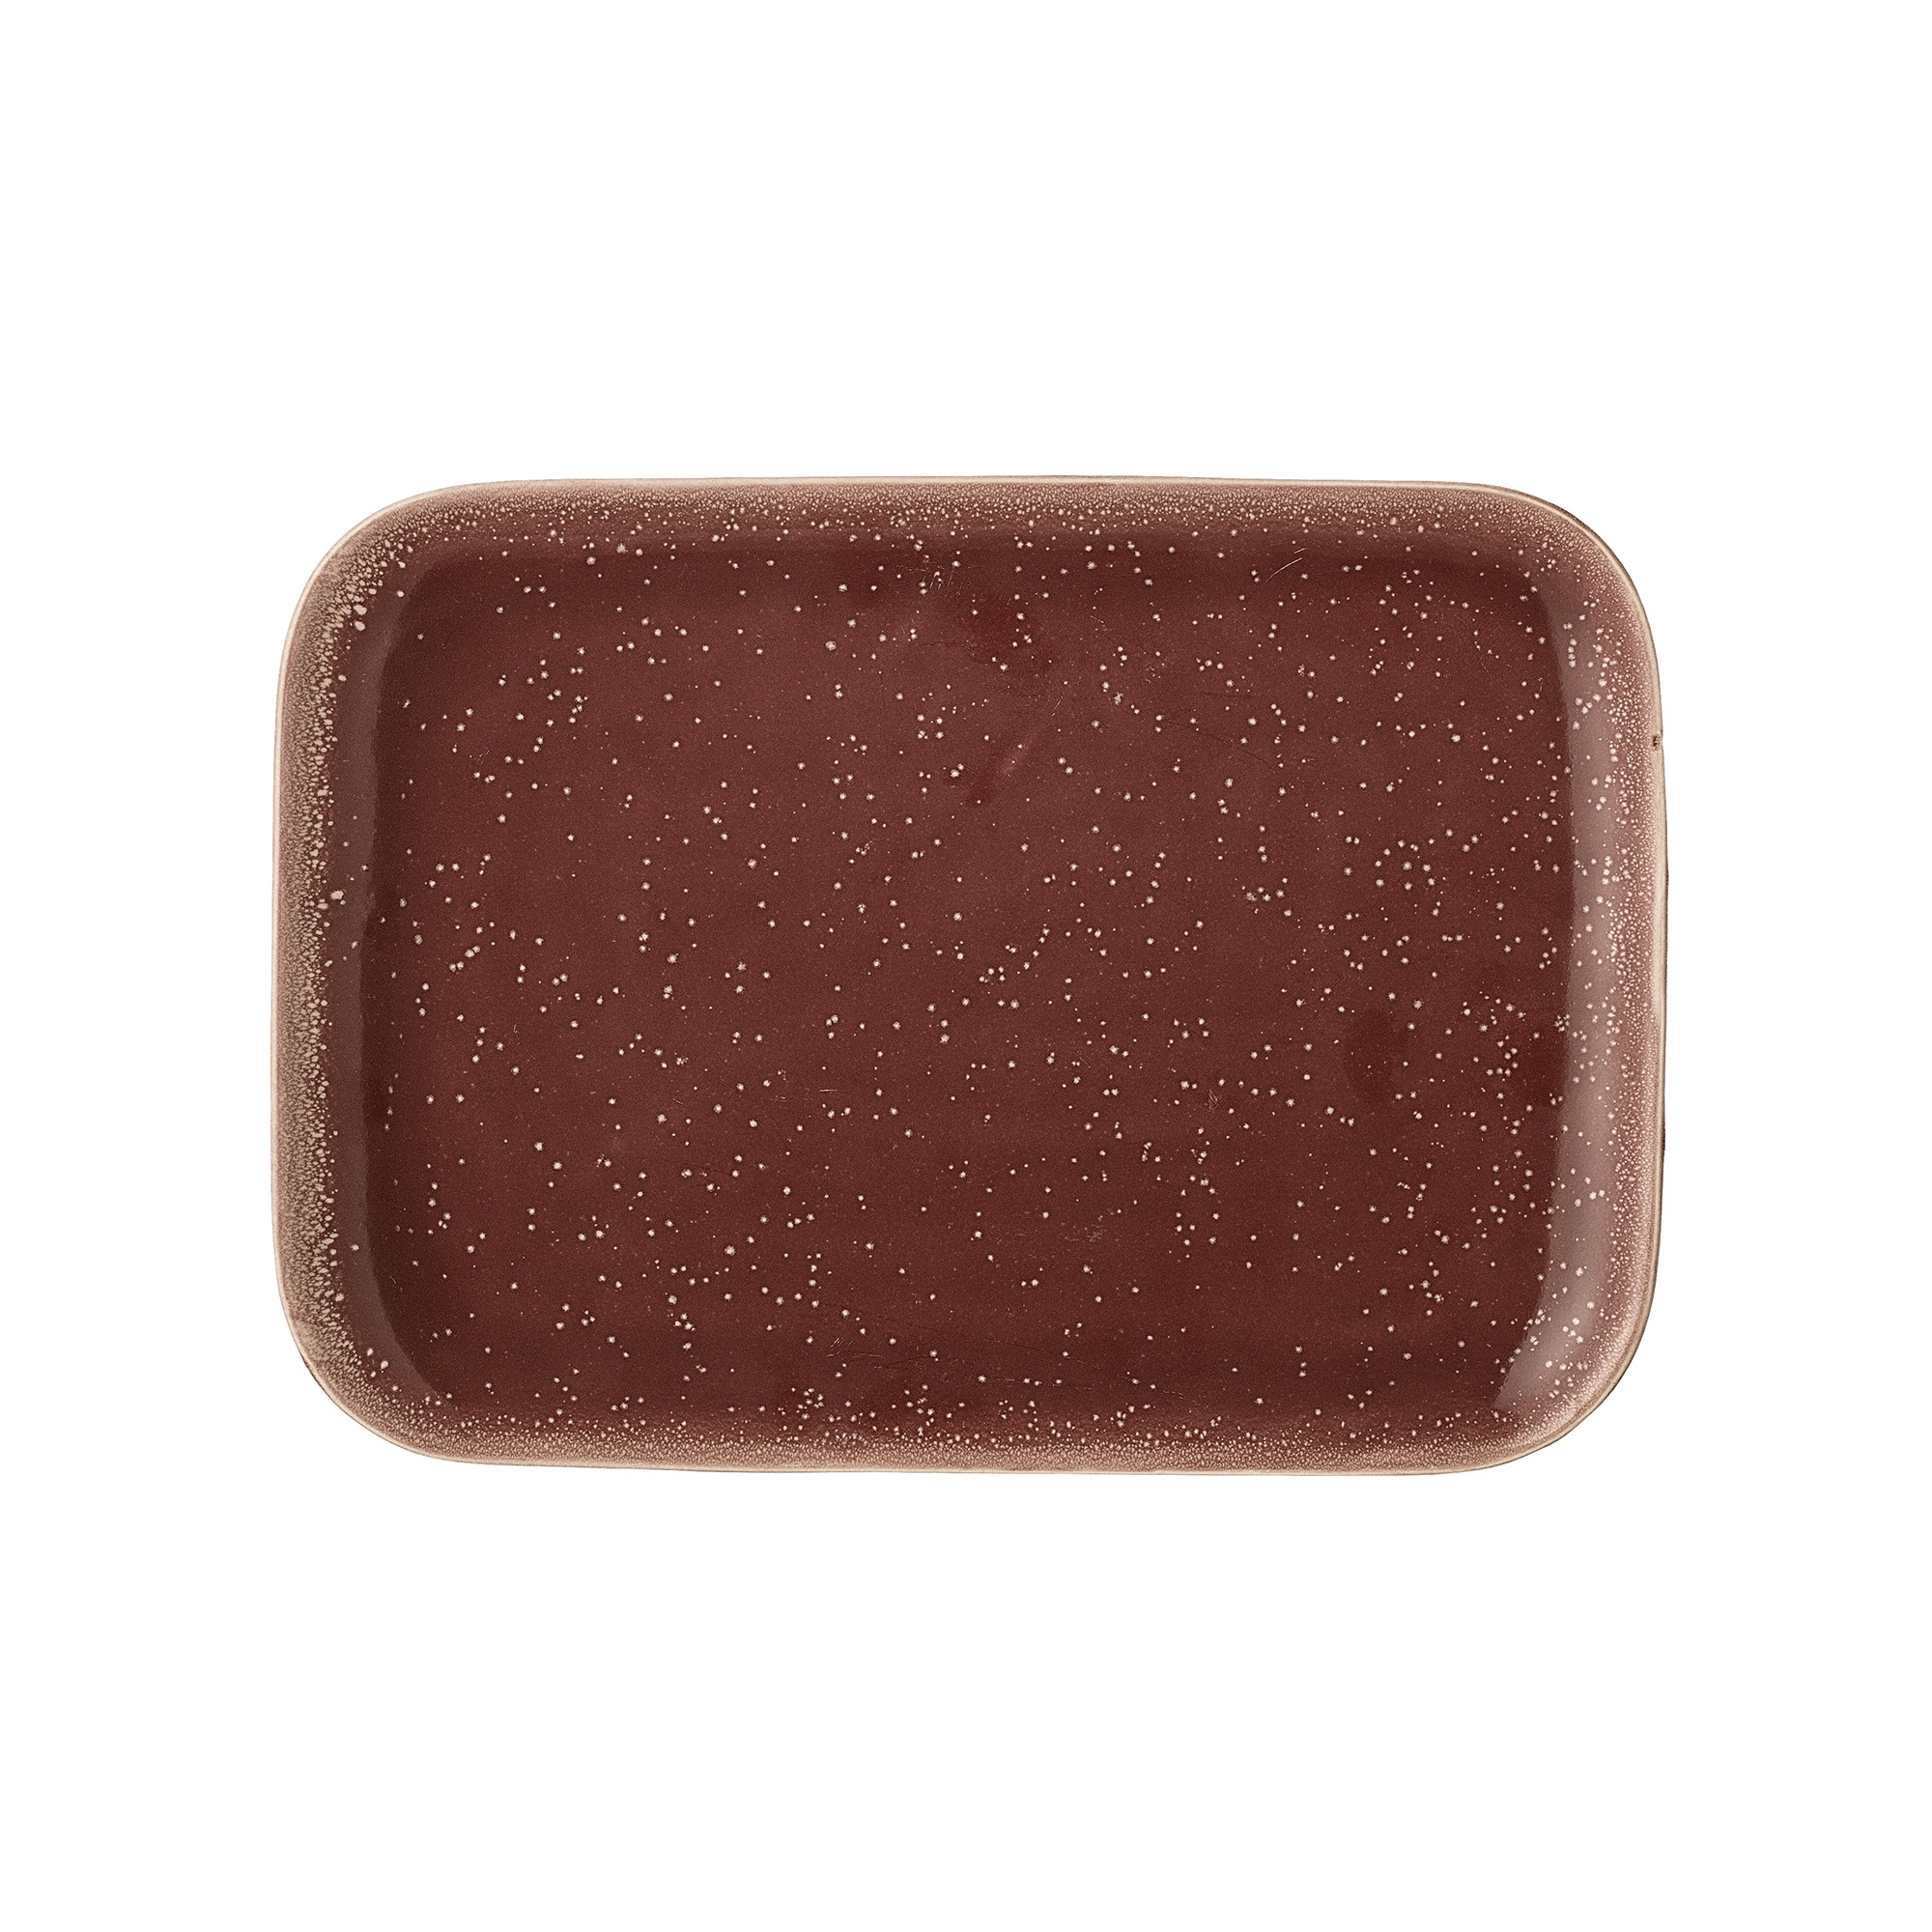 Platou Joelle din ceramica Red, l18xL25 cm